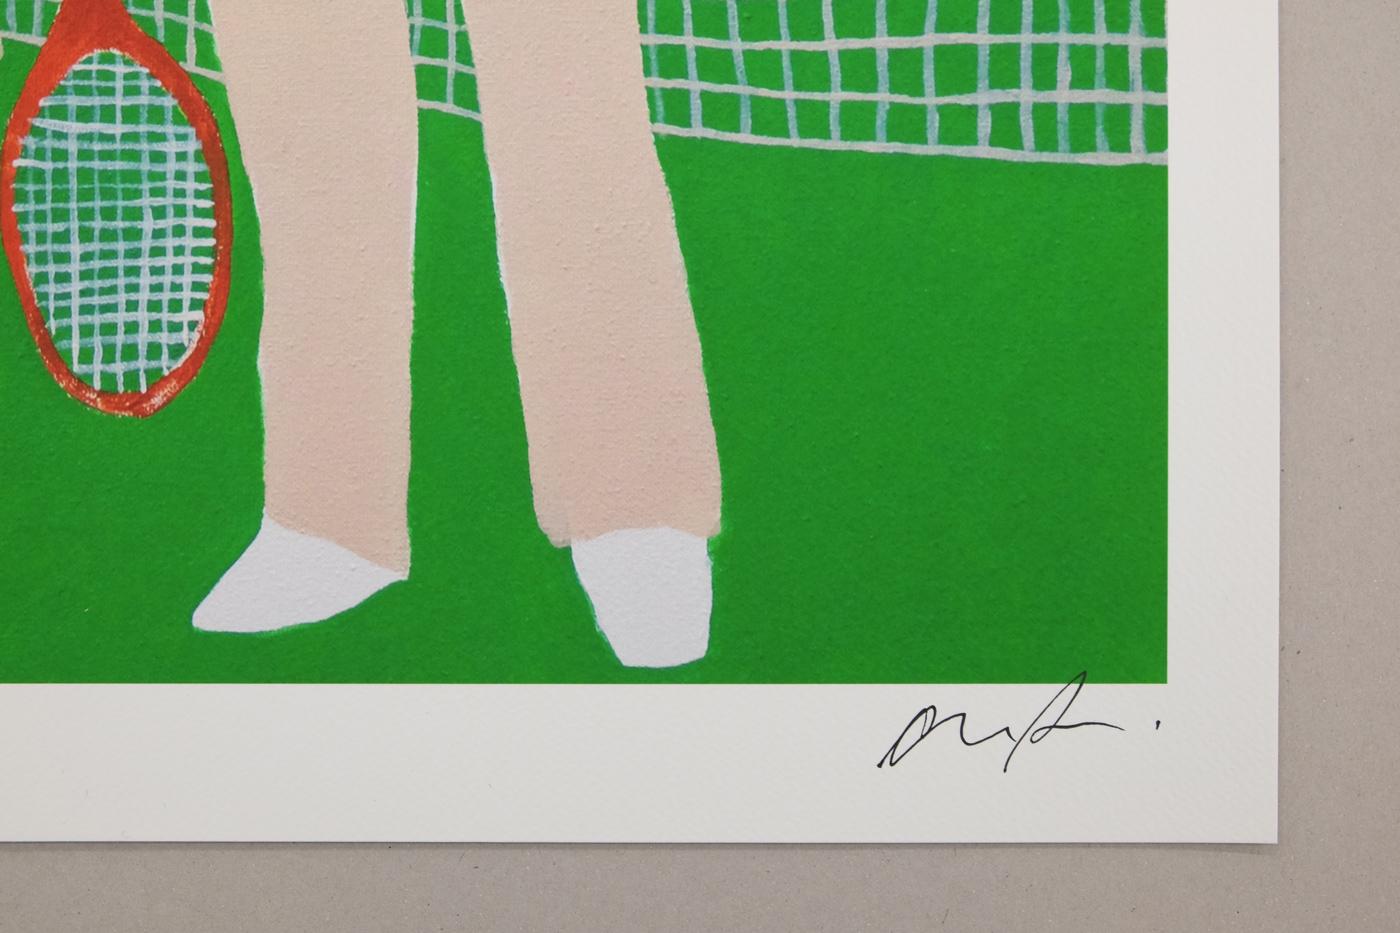 Alex Fears - signed art